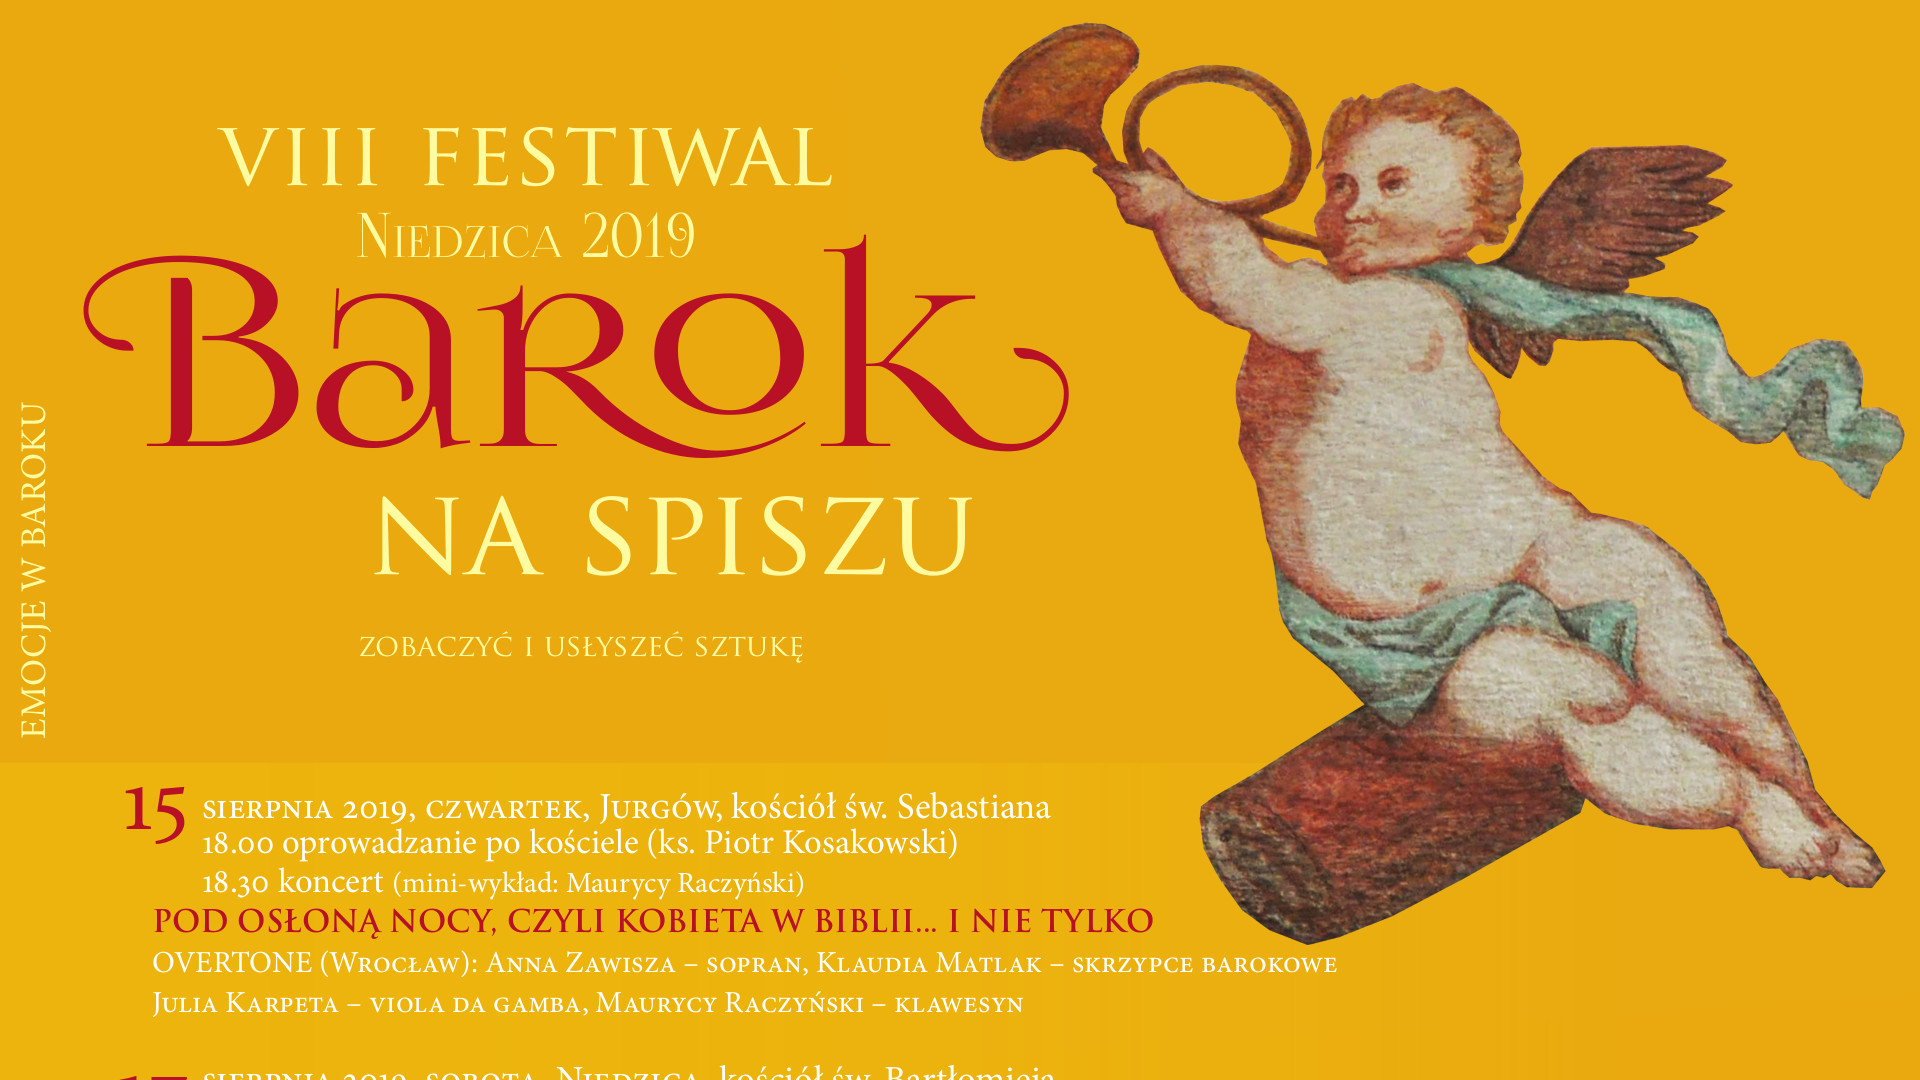 VIII Festiwal Barok na Spiszu 2019 - Jurgów